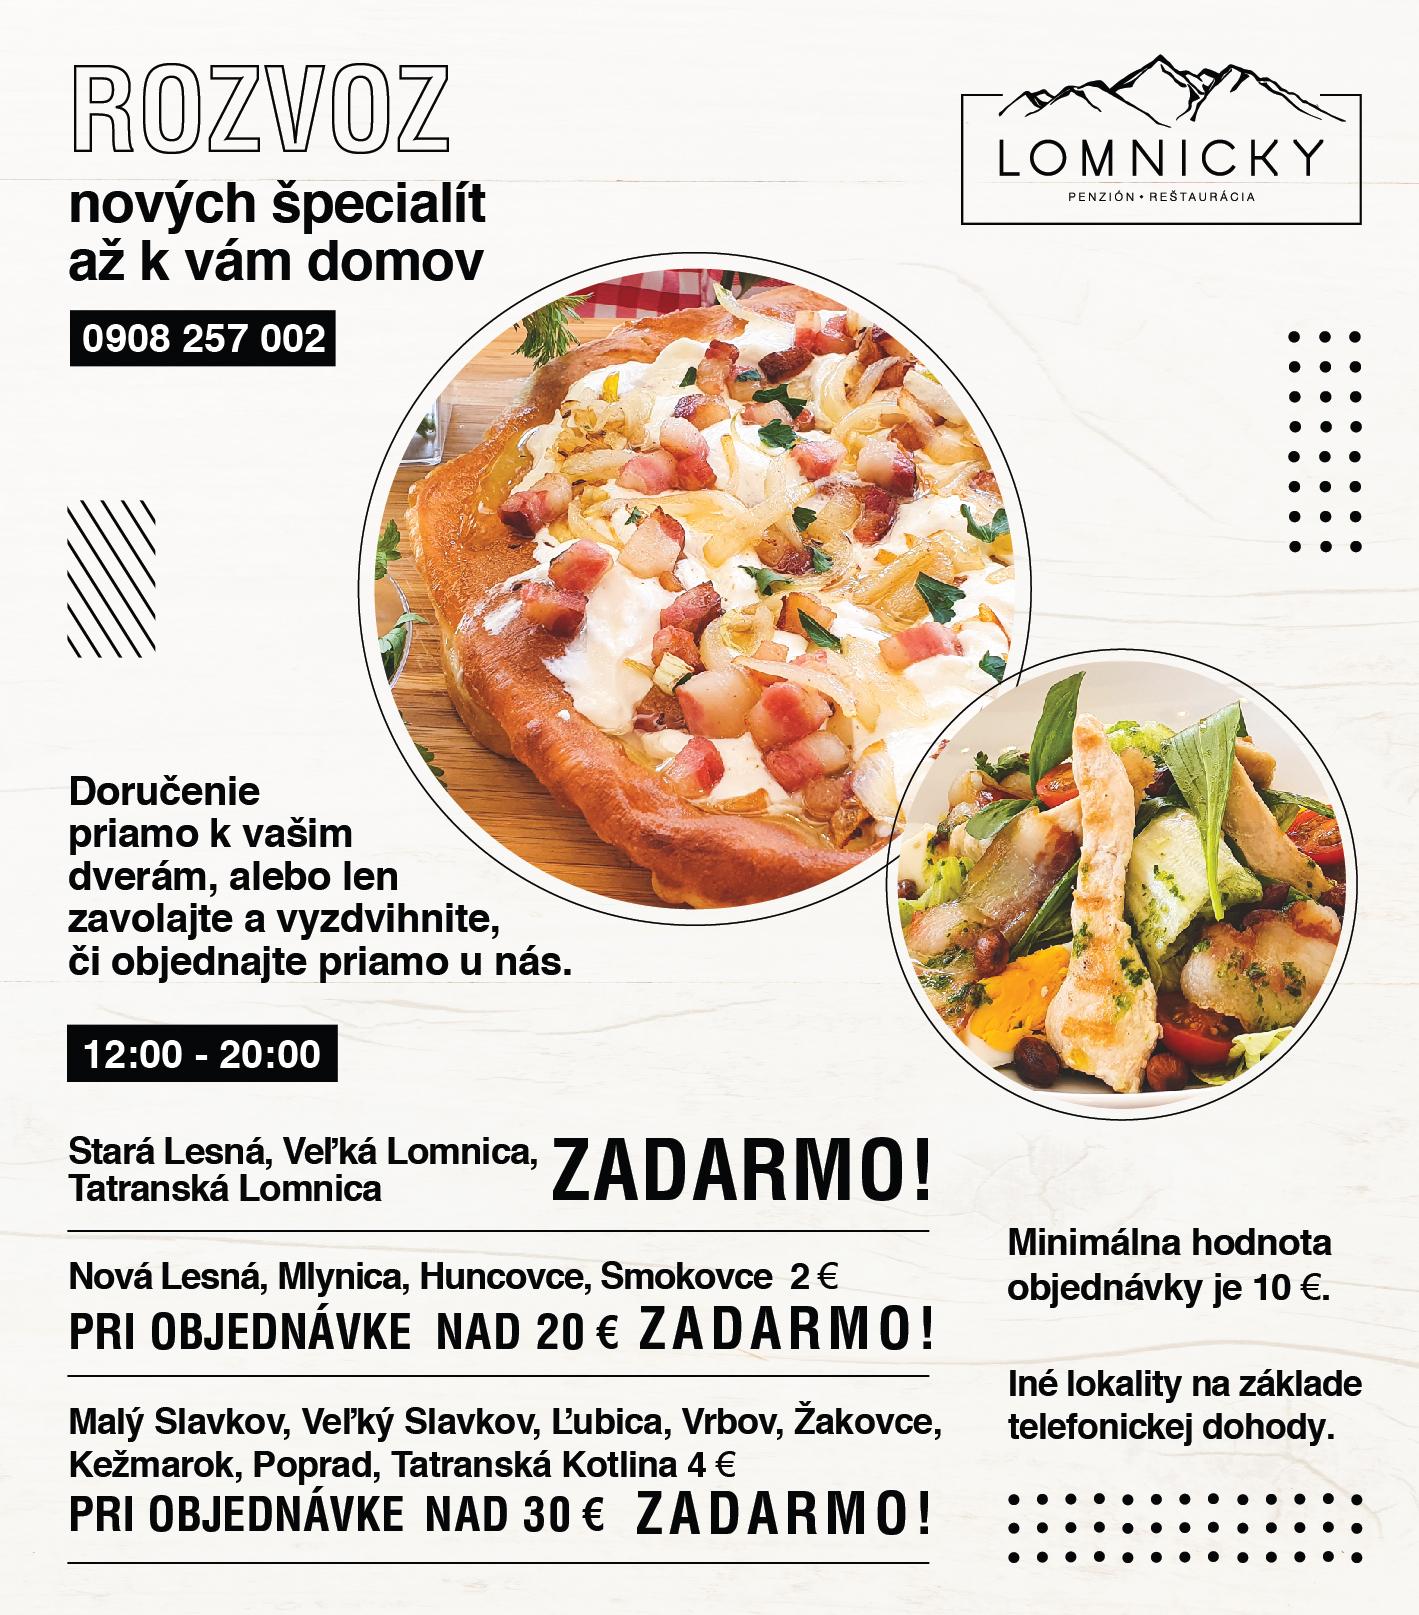 Penzion Lomnicky FB rozvoz-01